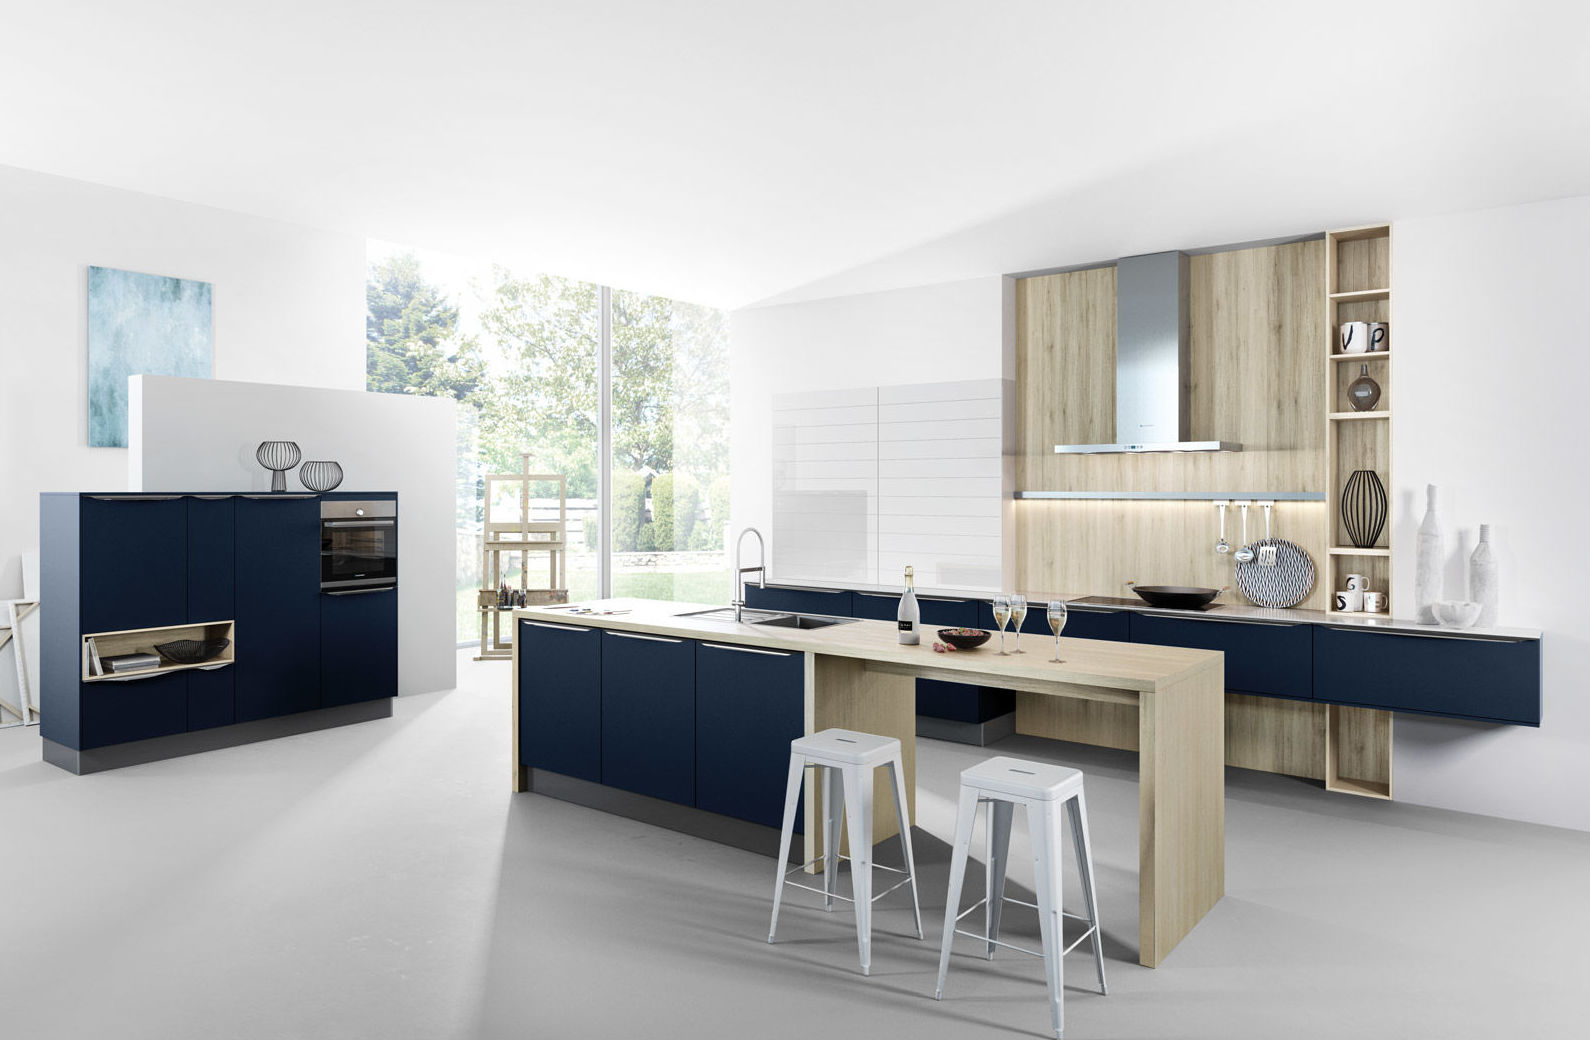 Muebles Cocina Diseño Moderno